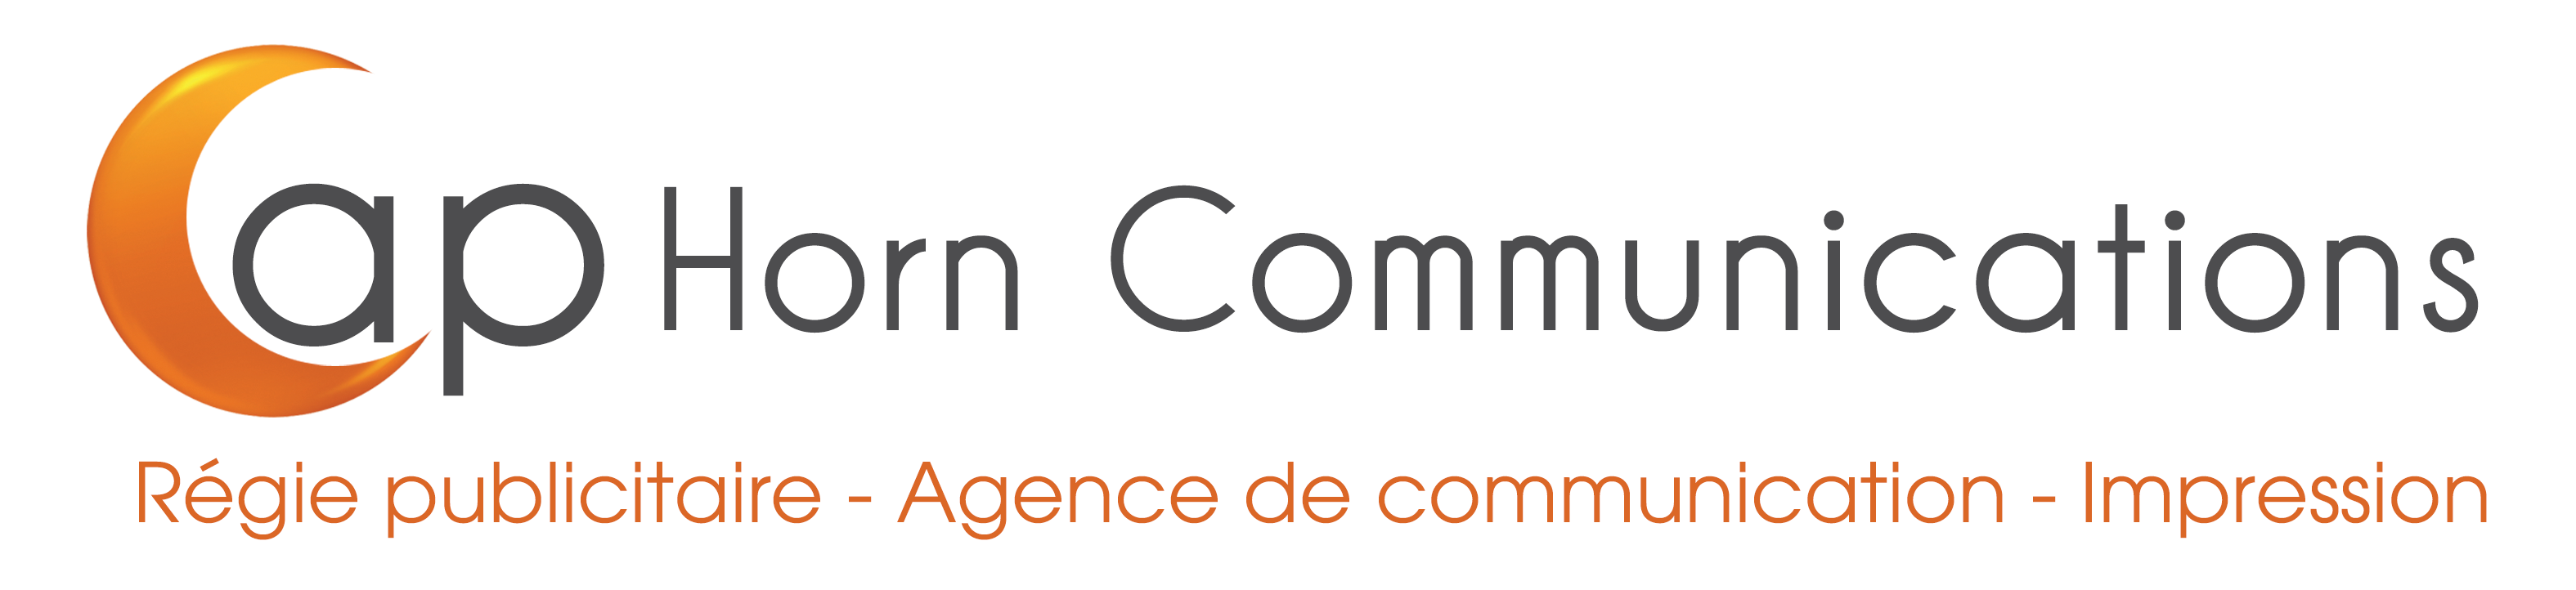 Logo Cap Horn Communications